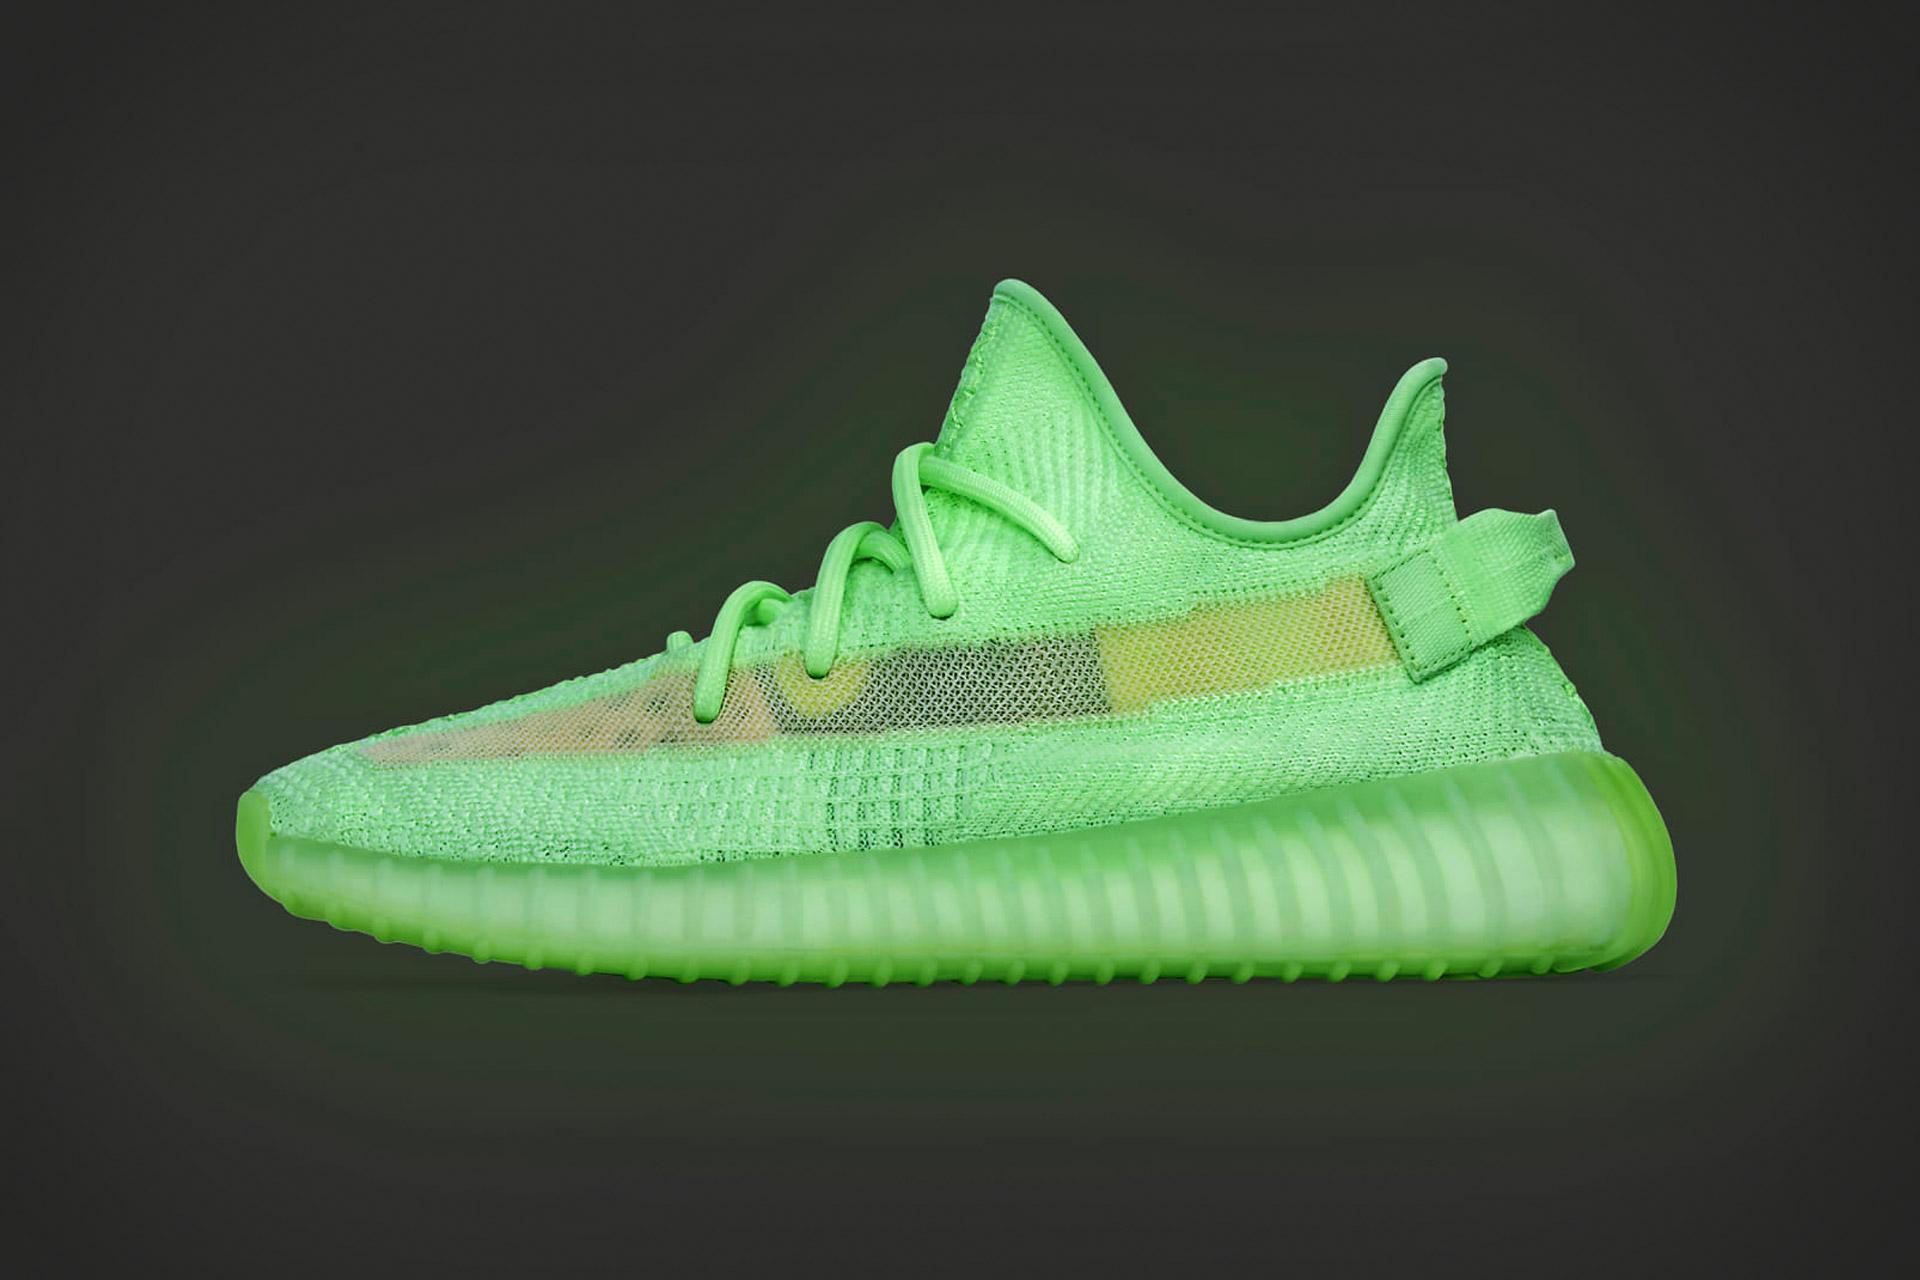 Adidas x Kanye West Yeezy Boost 350 V2 Glow Sneakers